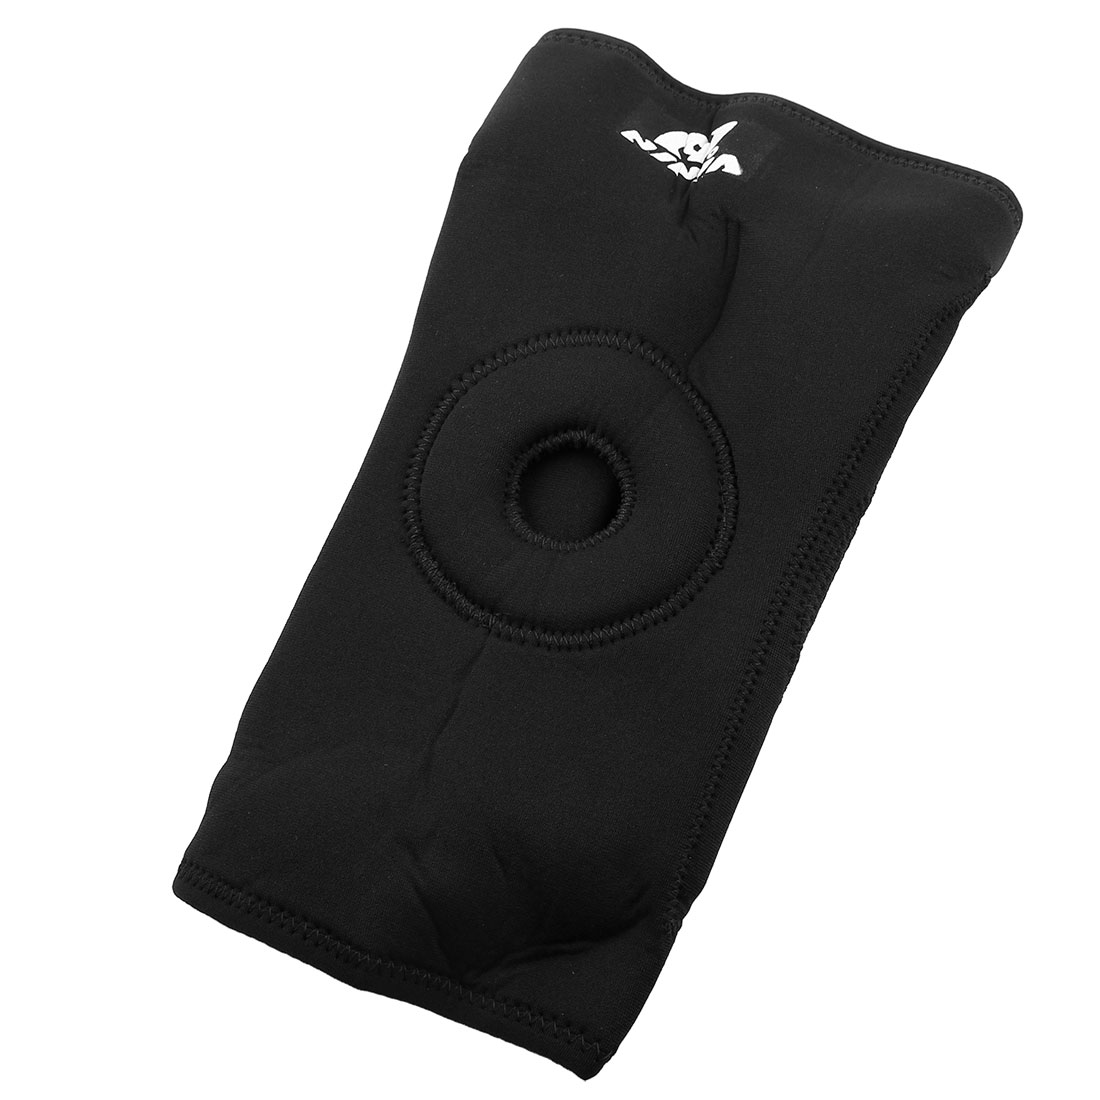 Black Stretchy Elastic Knee Brace Compression Support